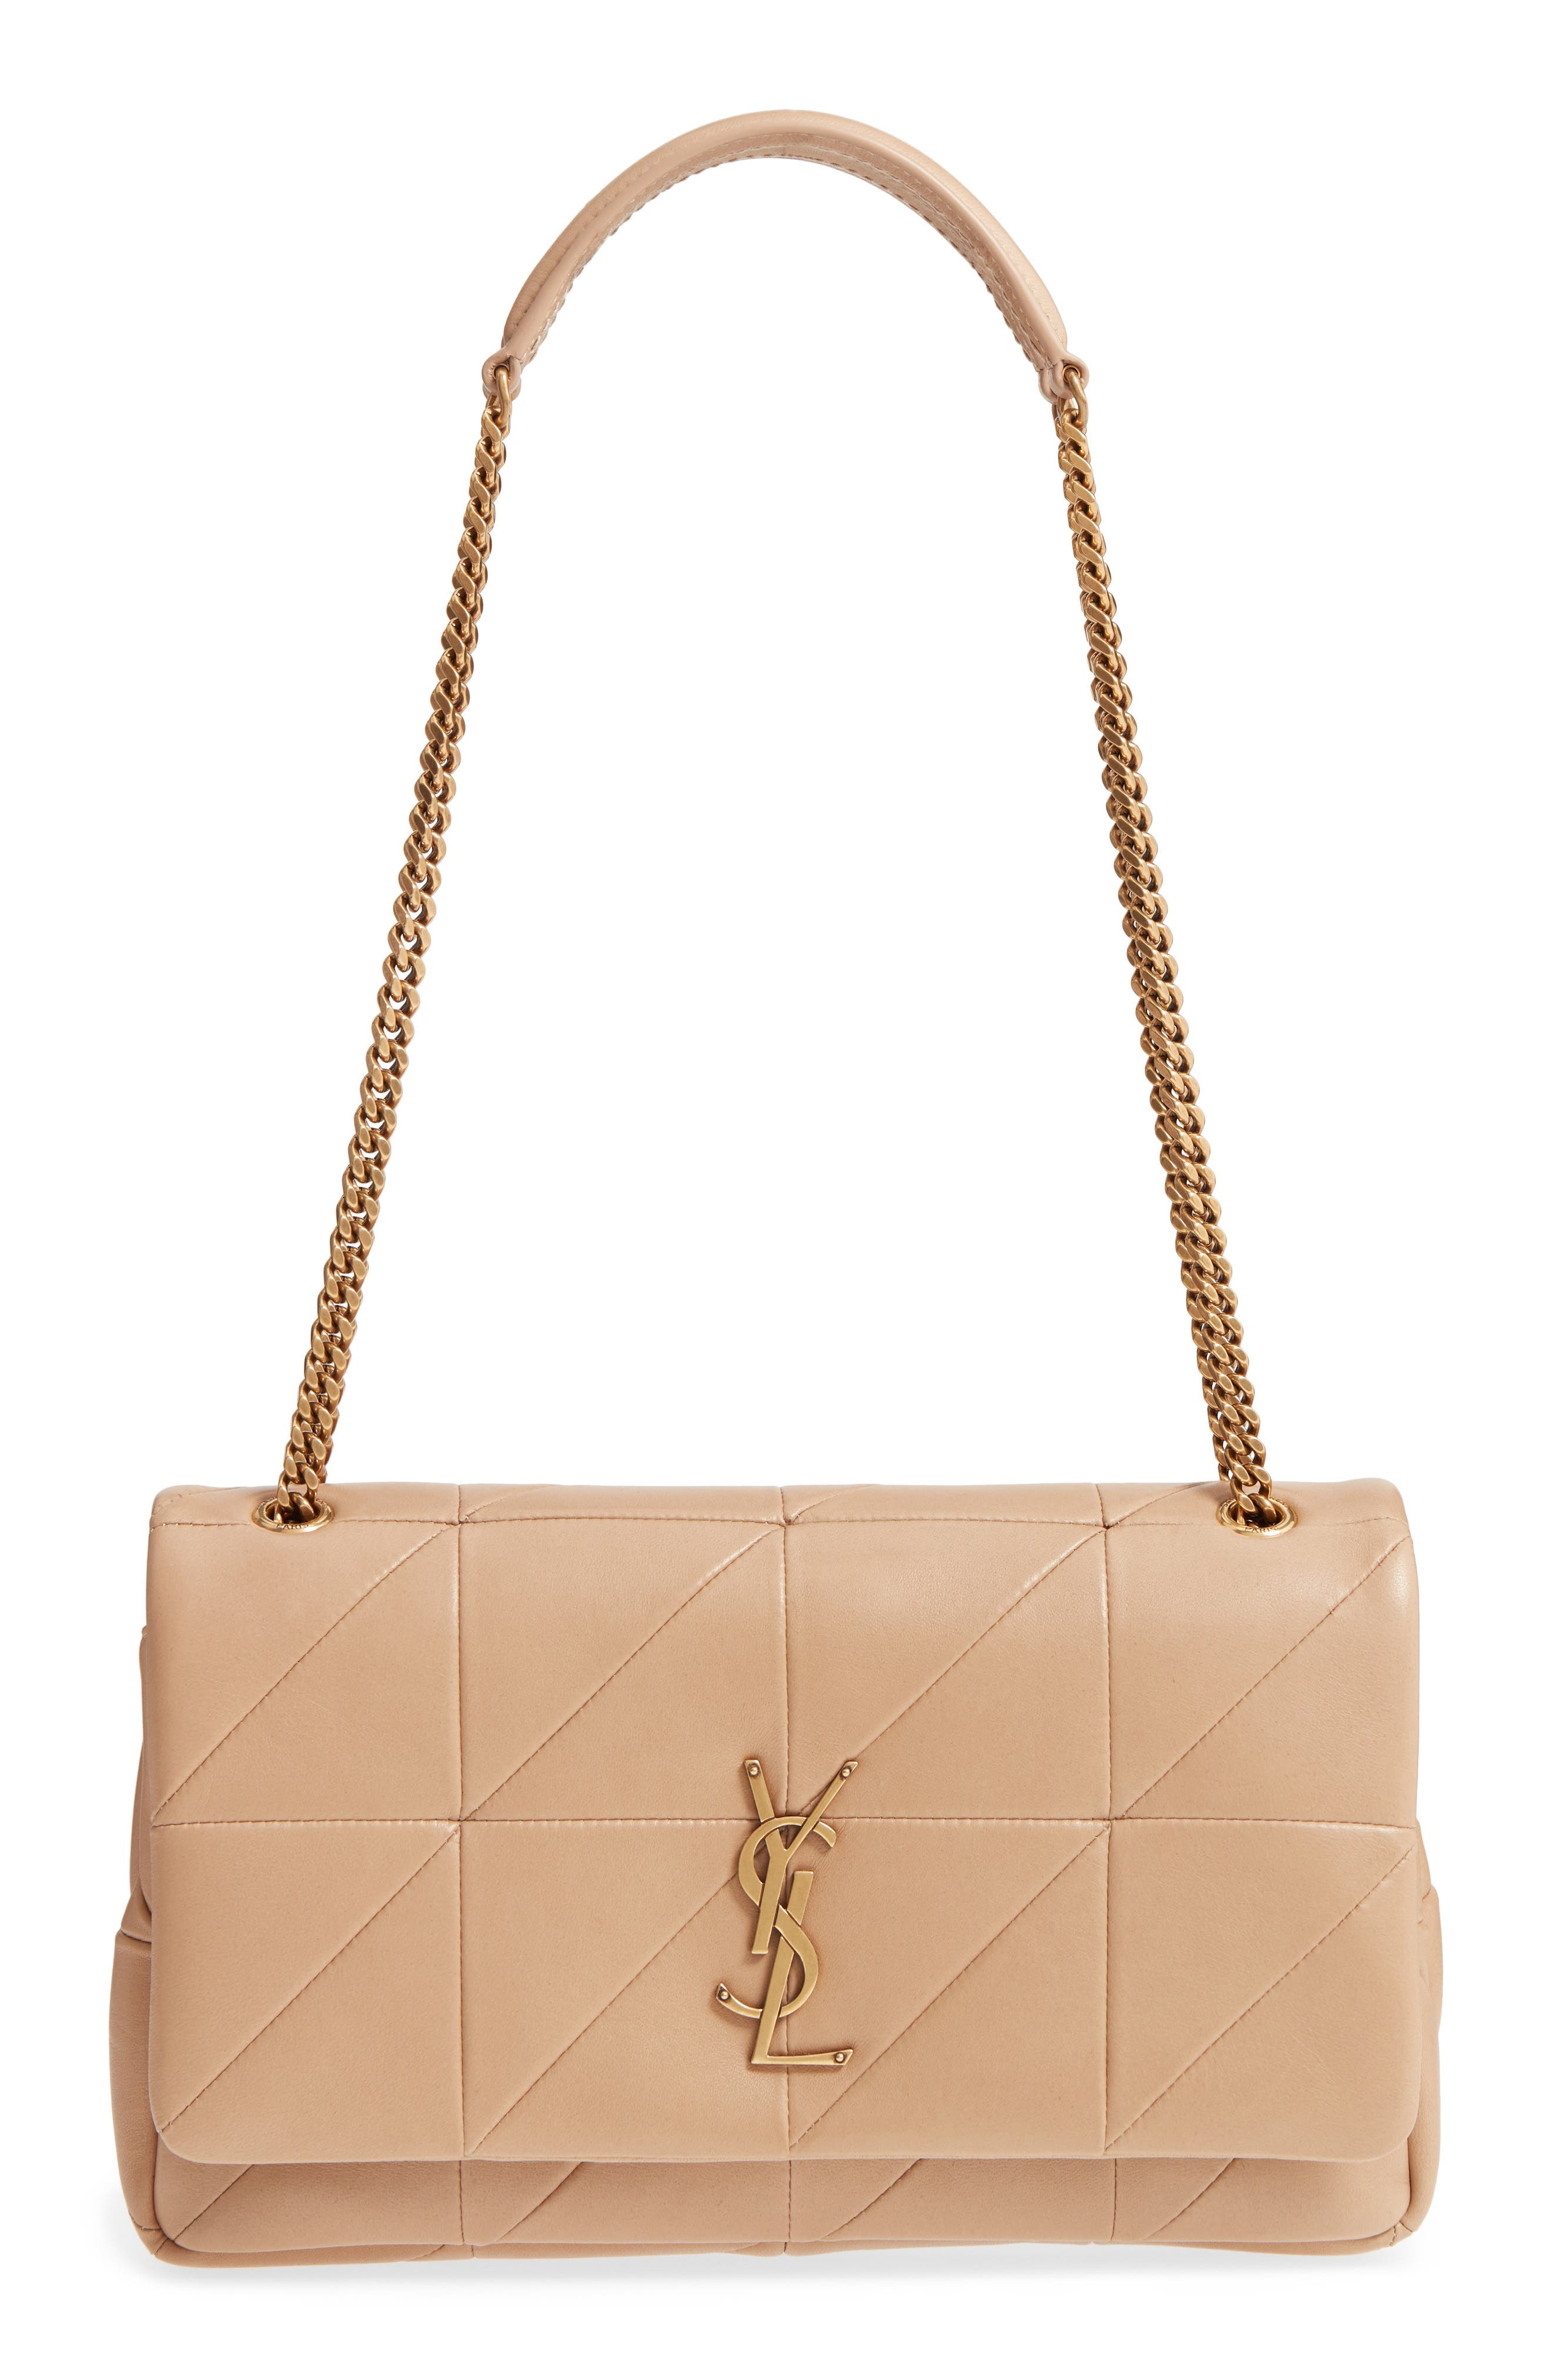 Saint Laurent Jamie Patchwork Leather Shoulder Bag